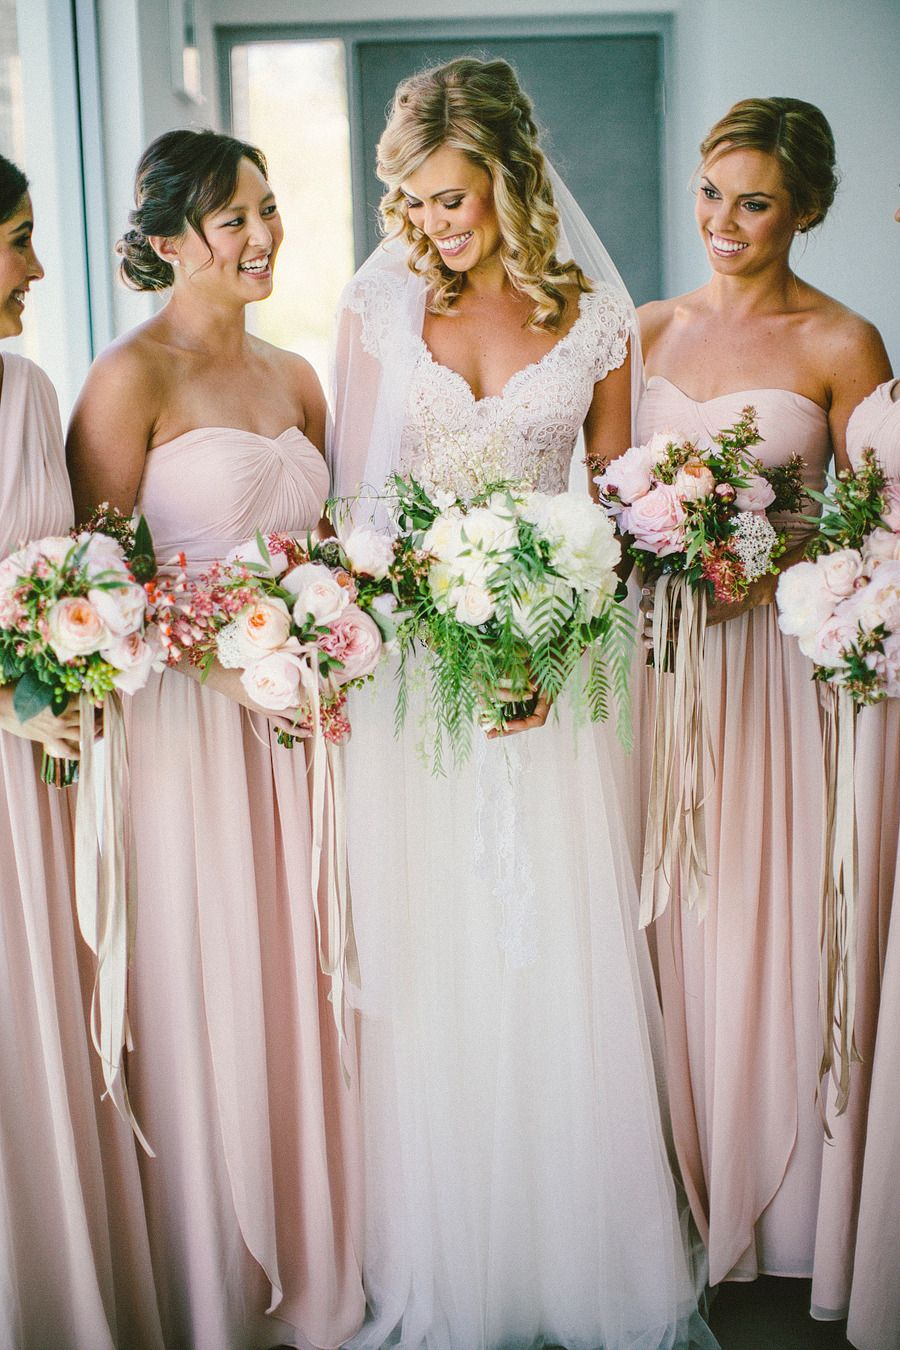 Perth wedding at acqua viva wedding weddings and wedding dress perth wedding at acqua viva ombrellifo Choice Image